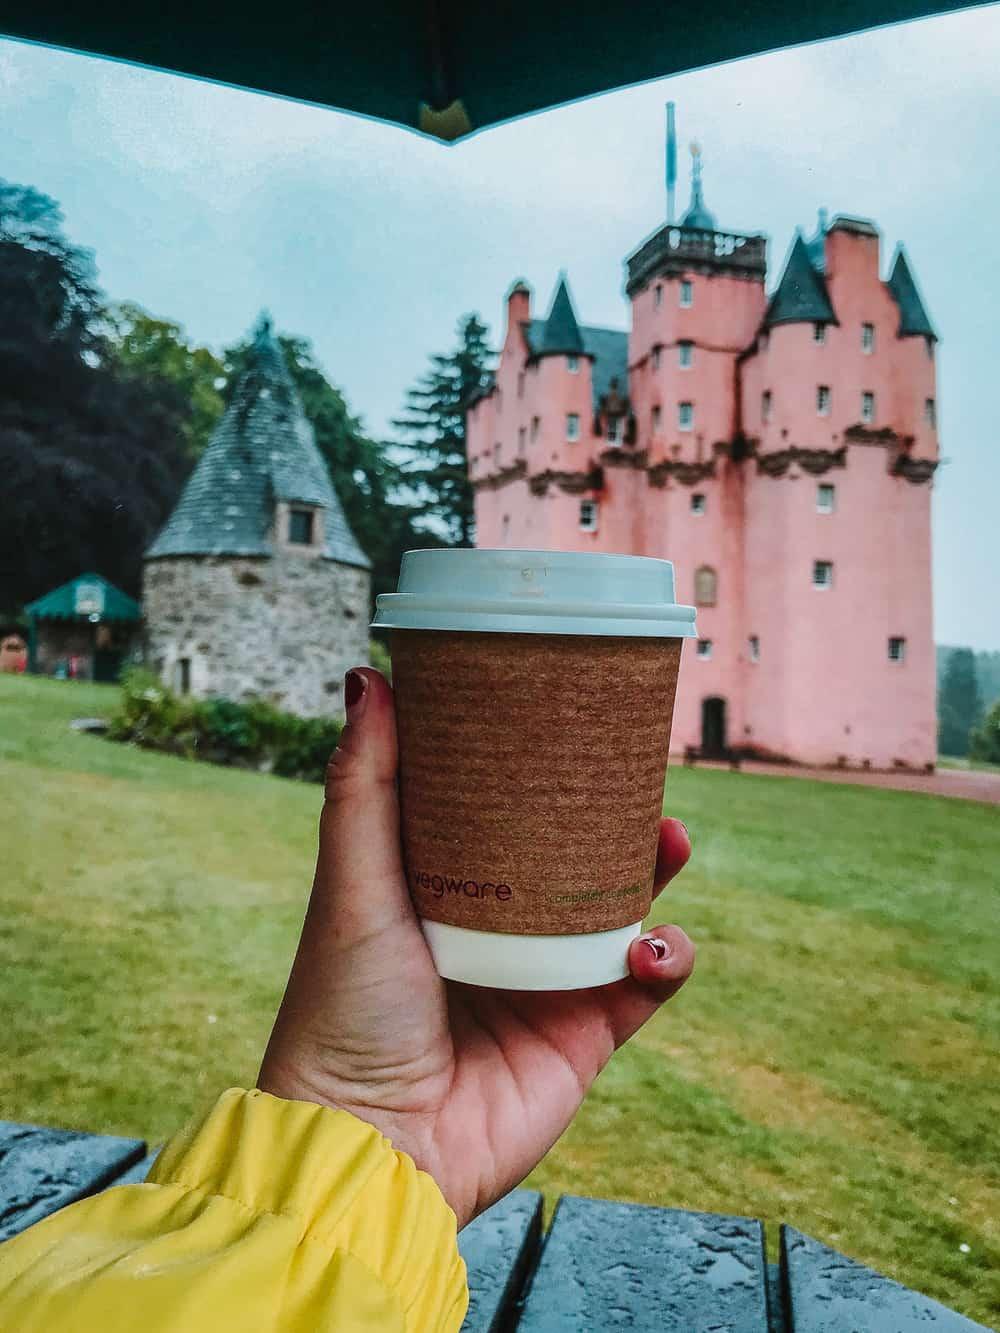 Is there a tea room at Craigievar Castle?